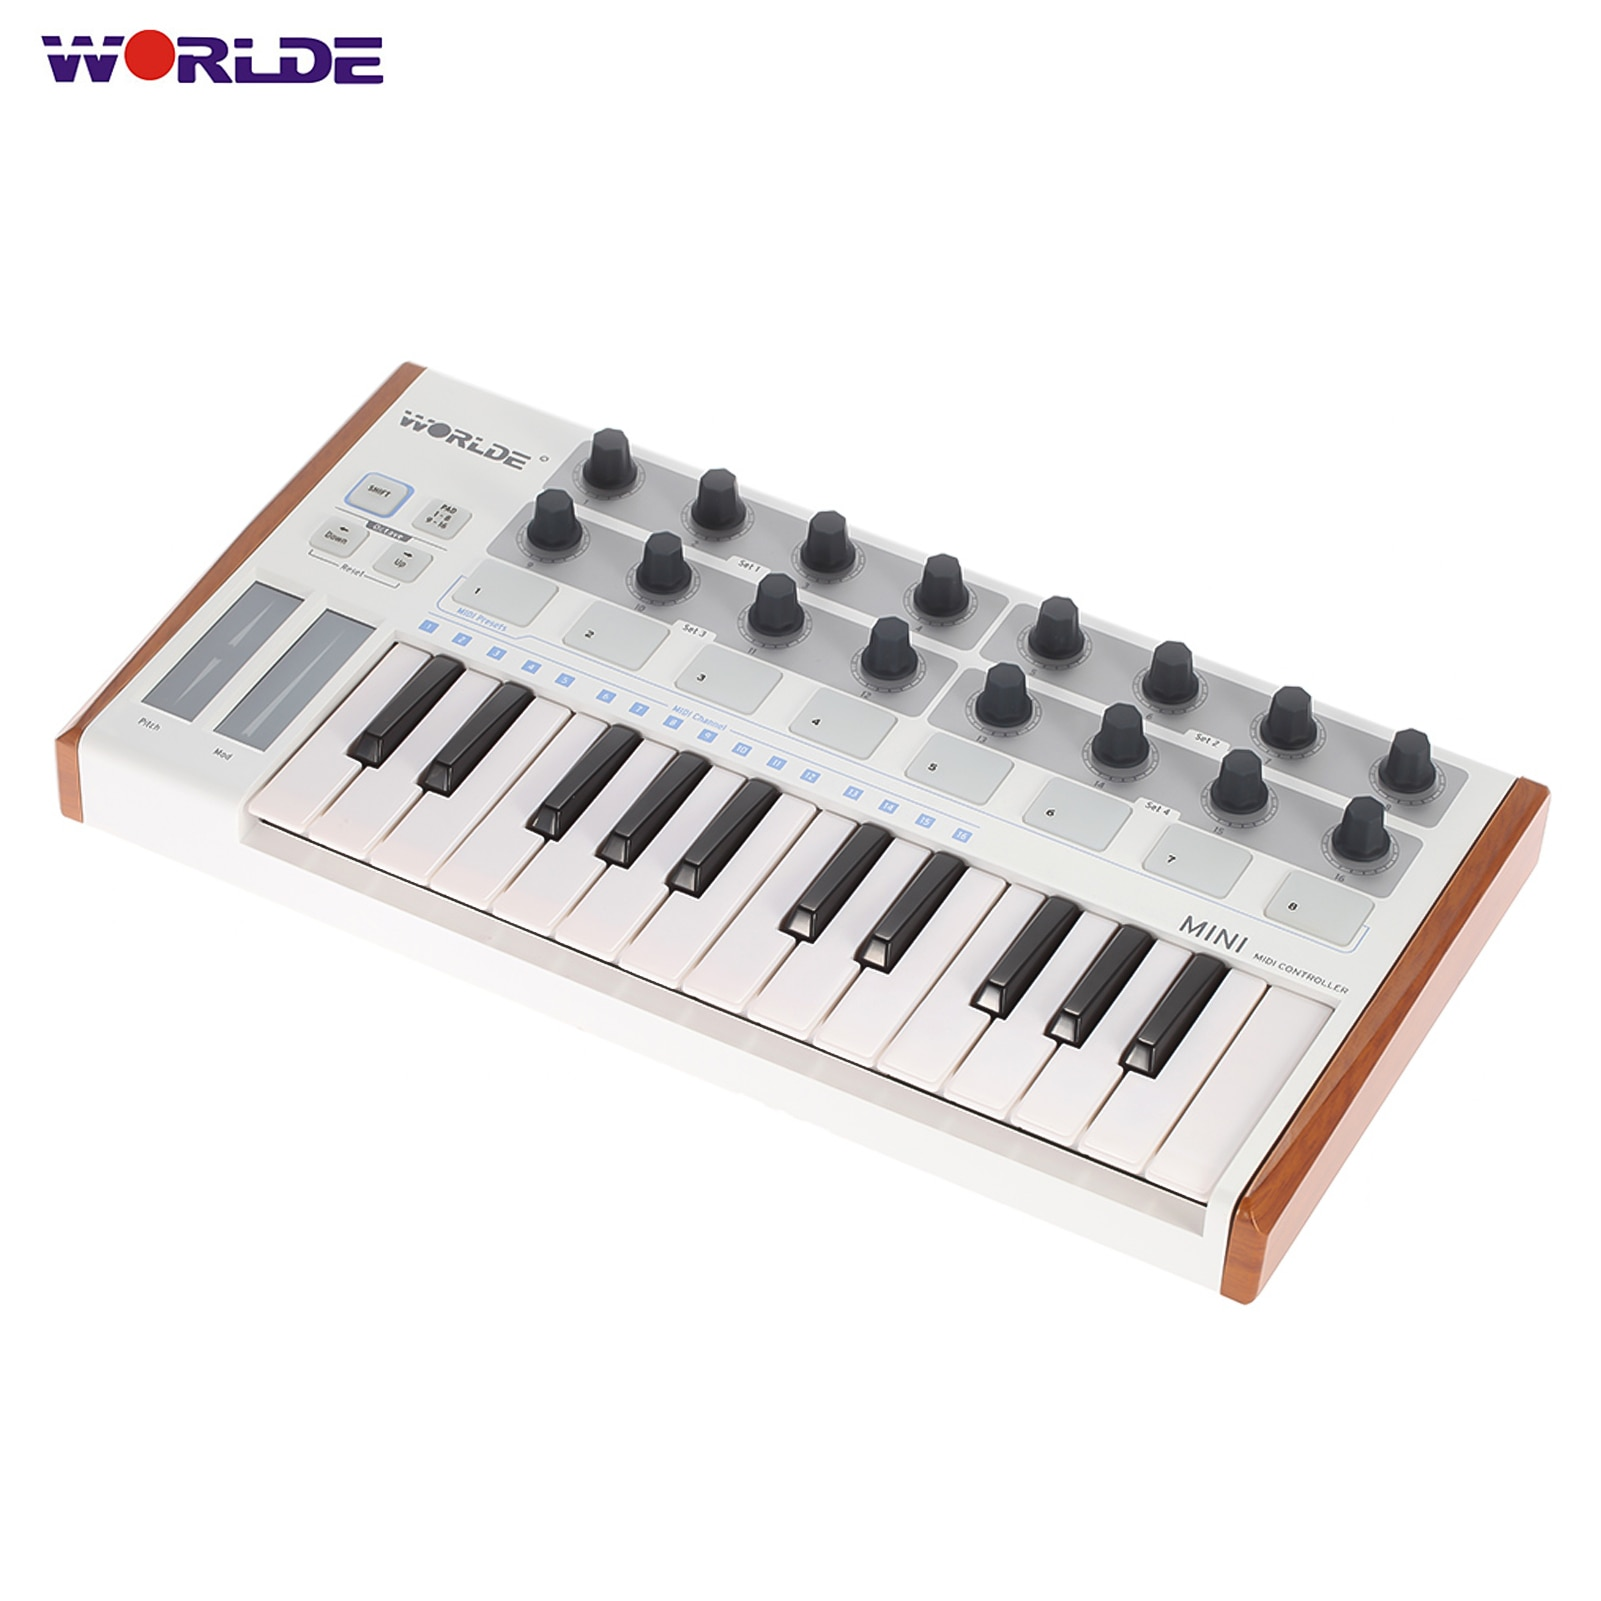 Worlde المحمولة وحدة تحكم بلوحة مفاتيح صغيرة المهنية 25-مفتاح USB ميدي تحكم طبل الوسادة لوحة المفاتيح أدوات جهاز إلكتروني